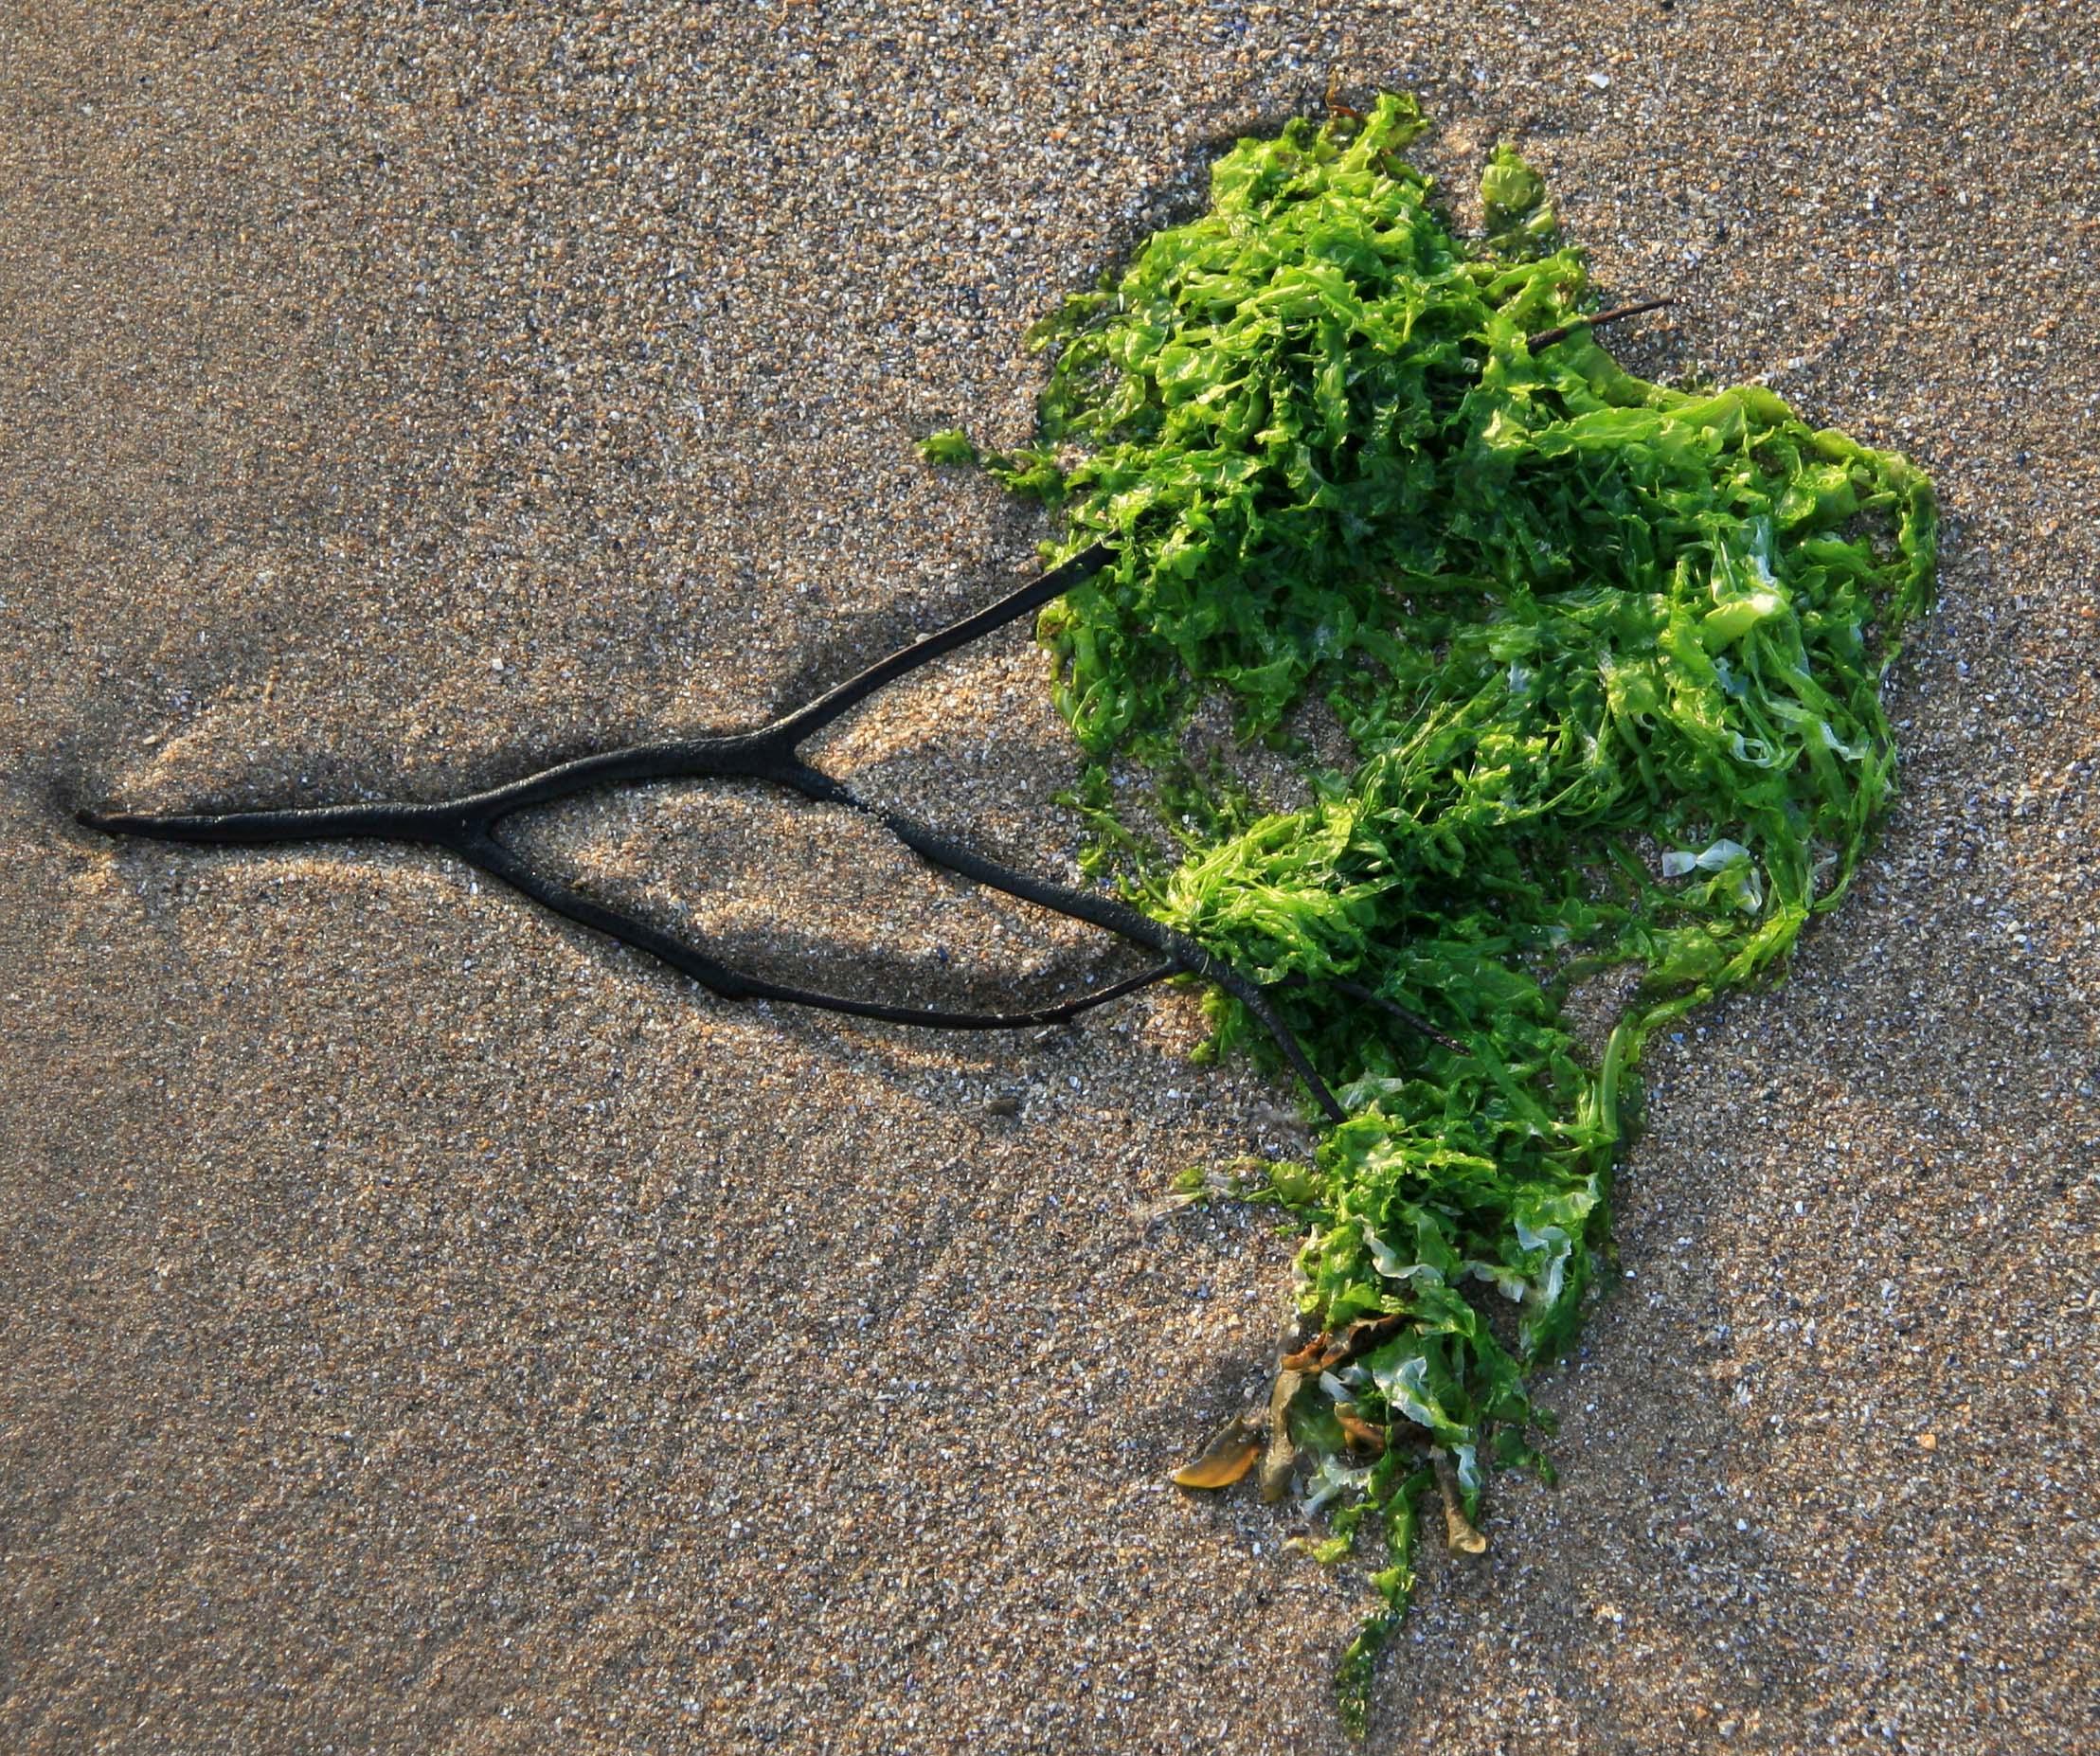 seaweed--aphrodisiac nutrition